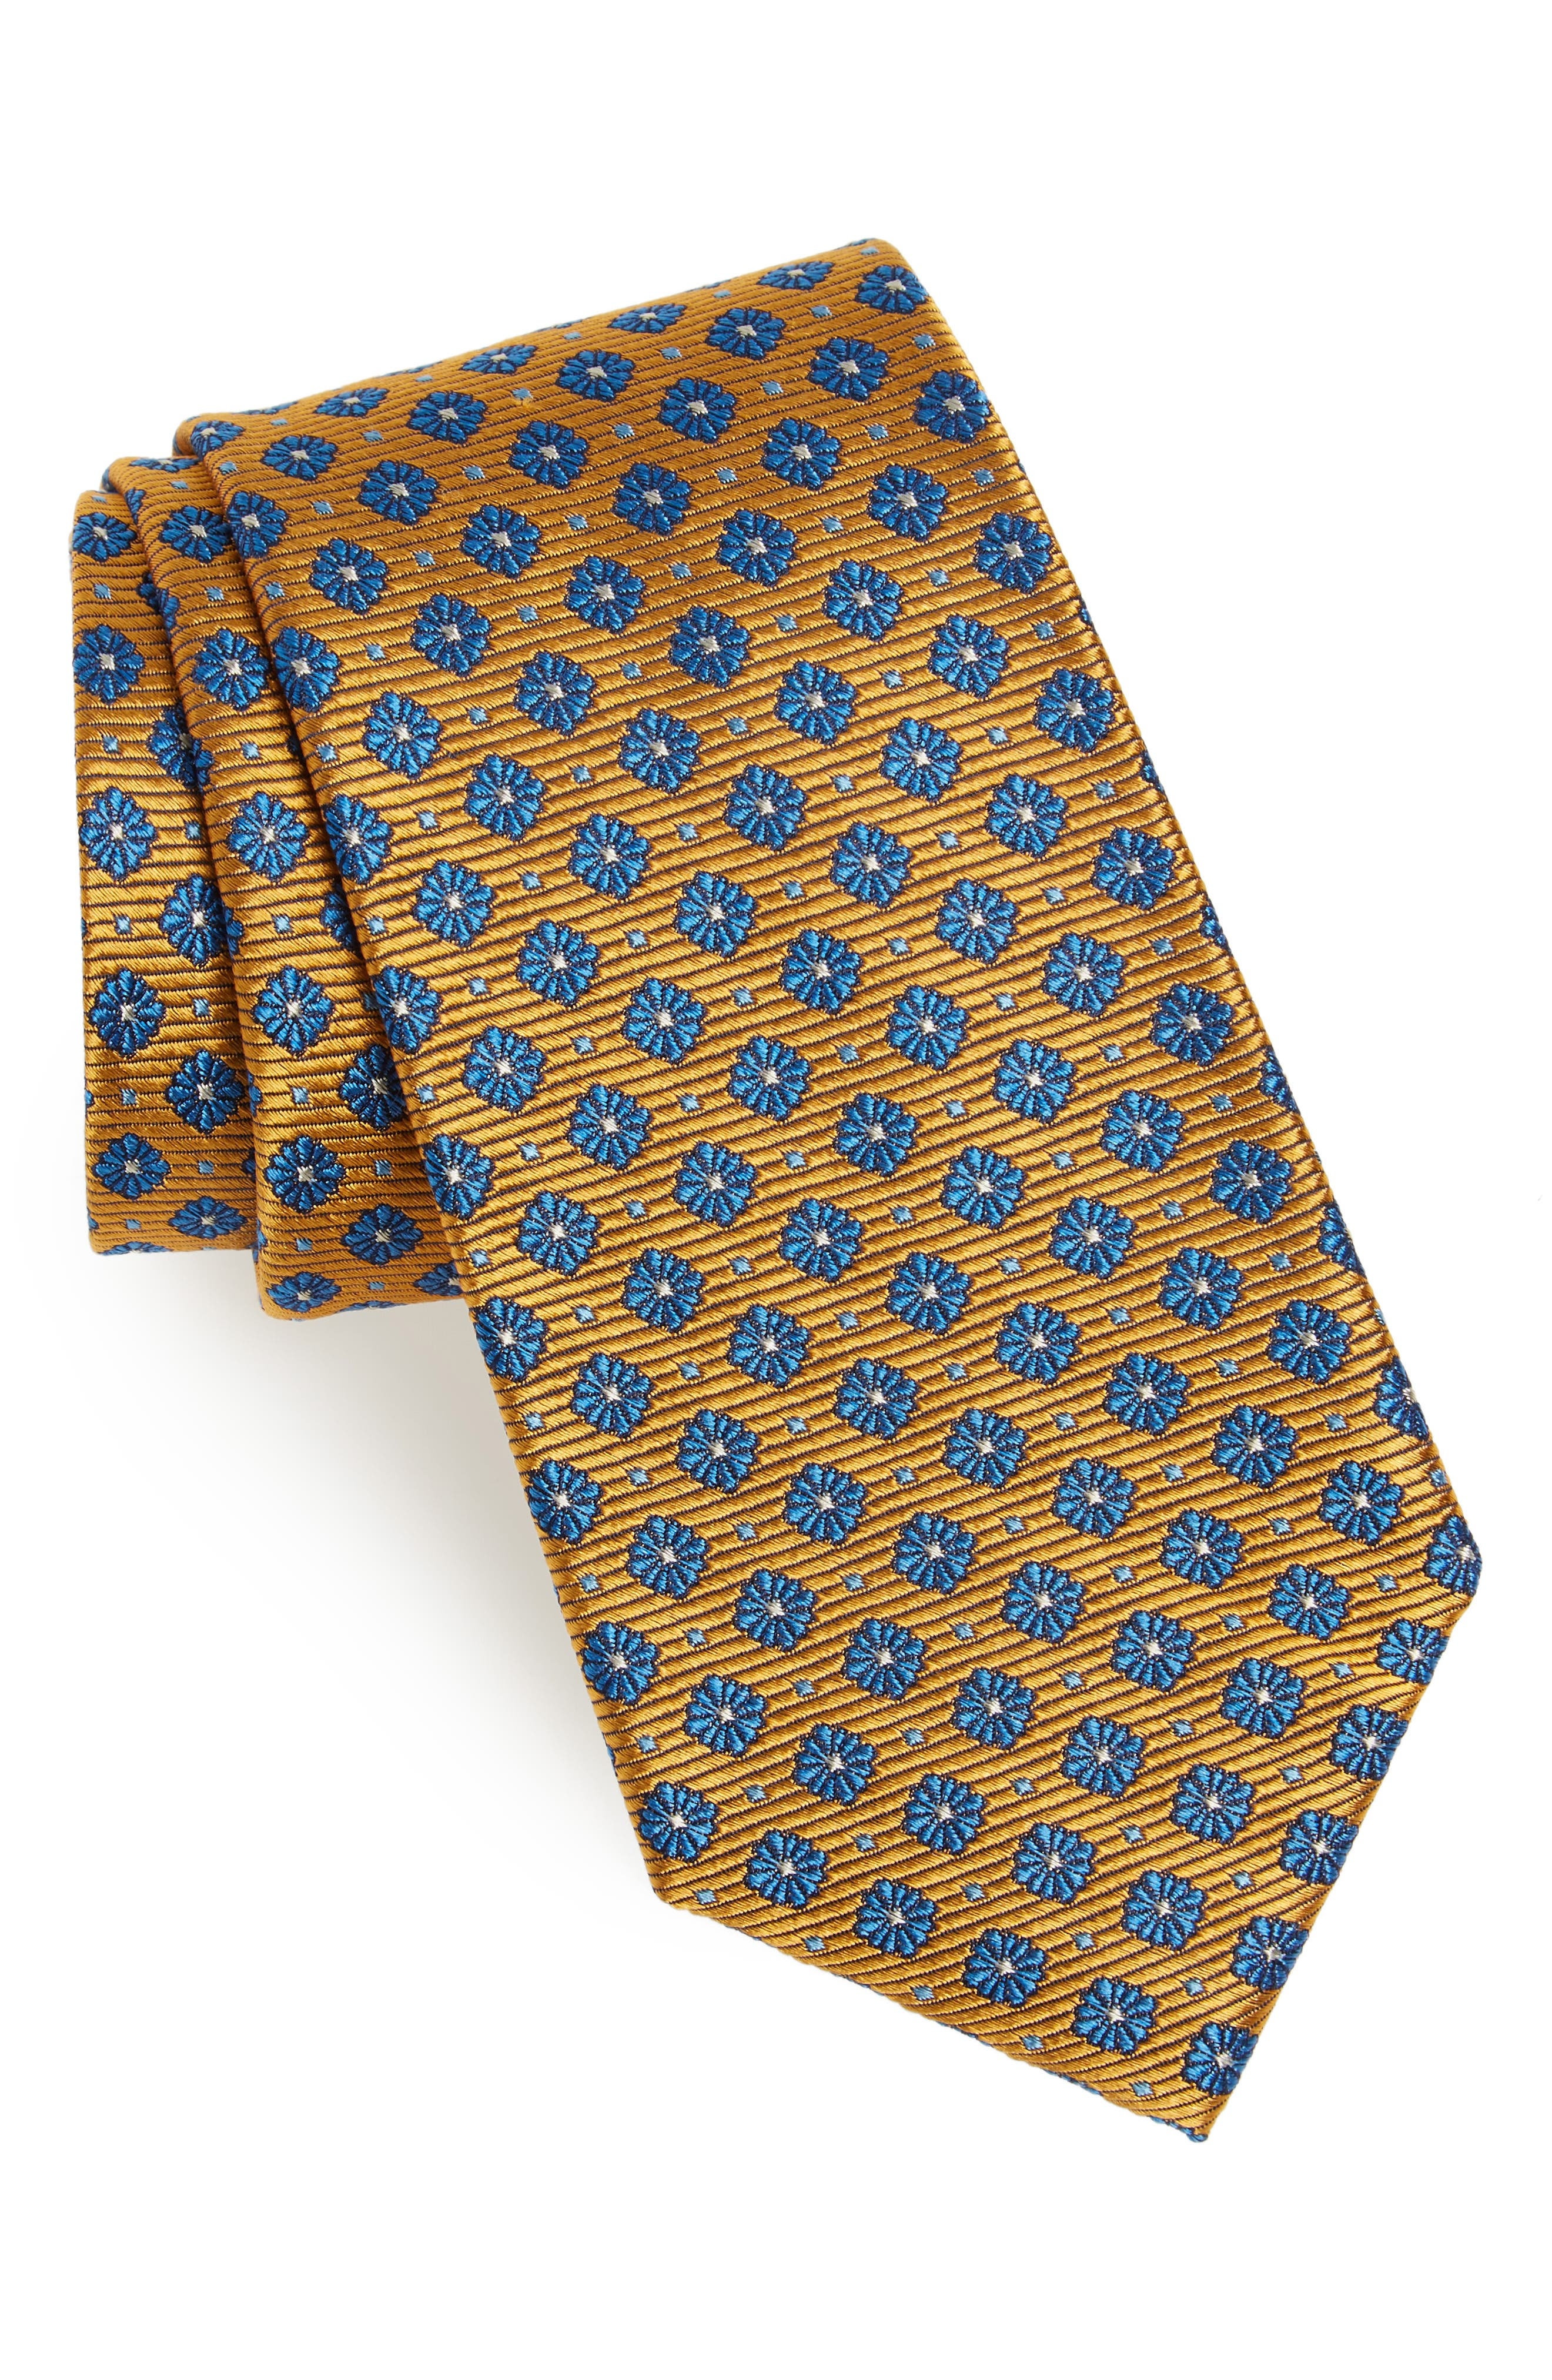 Nordstrom Men's Shop Notting Hill Neat Silk Tie